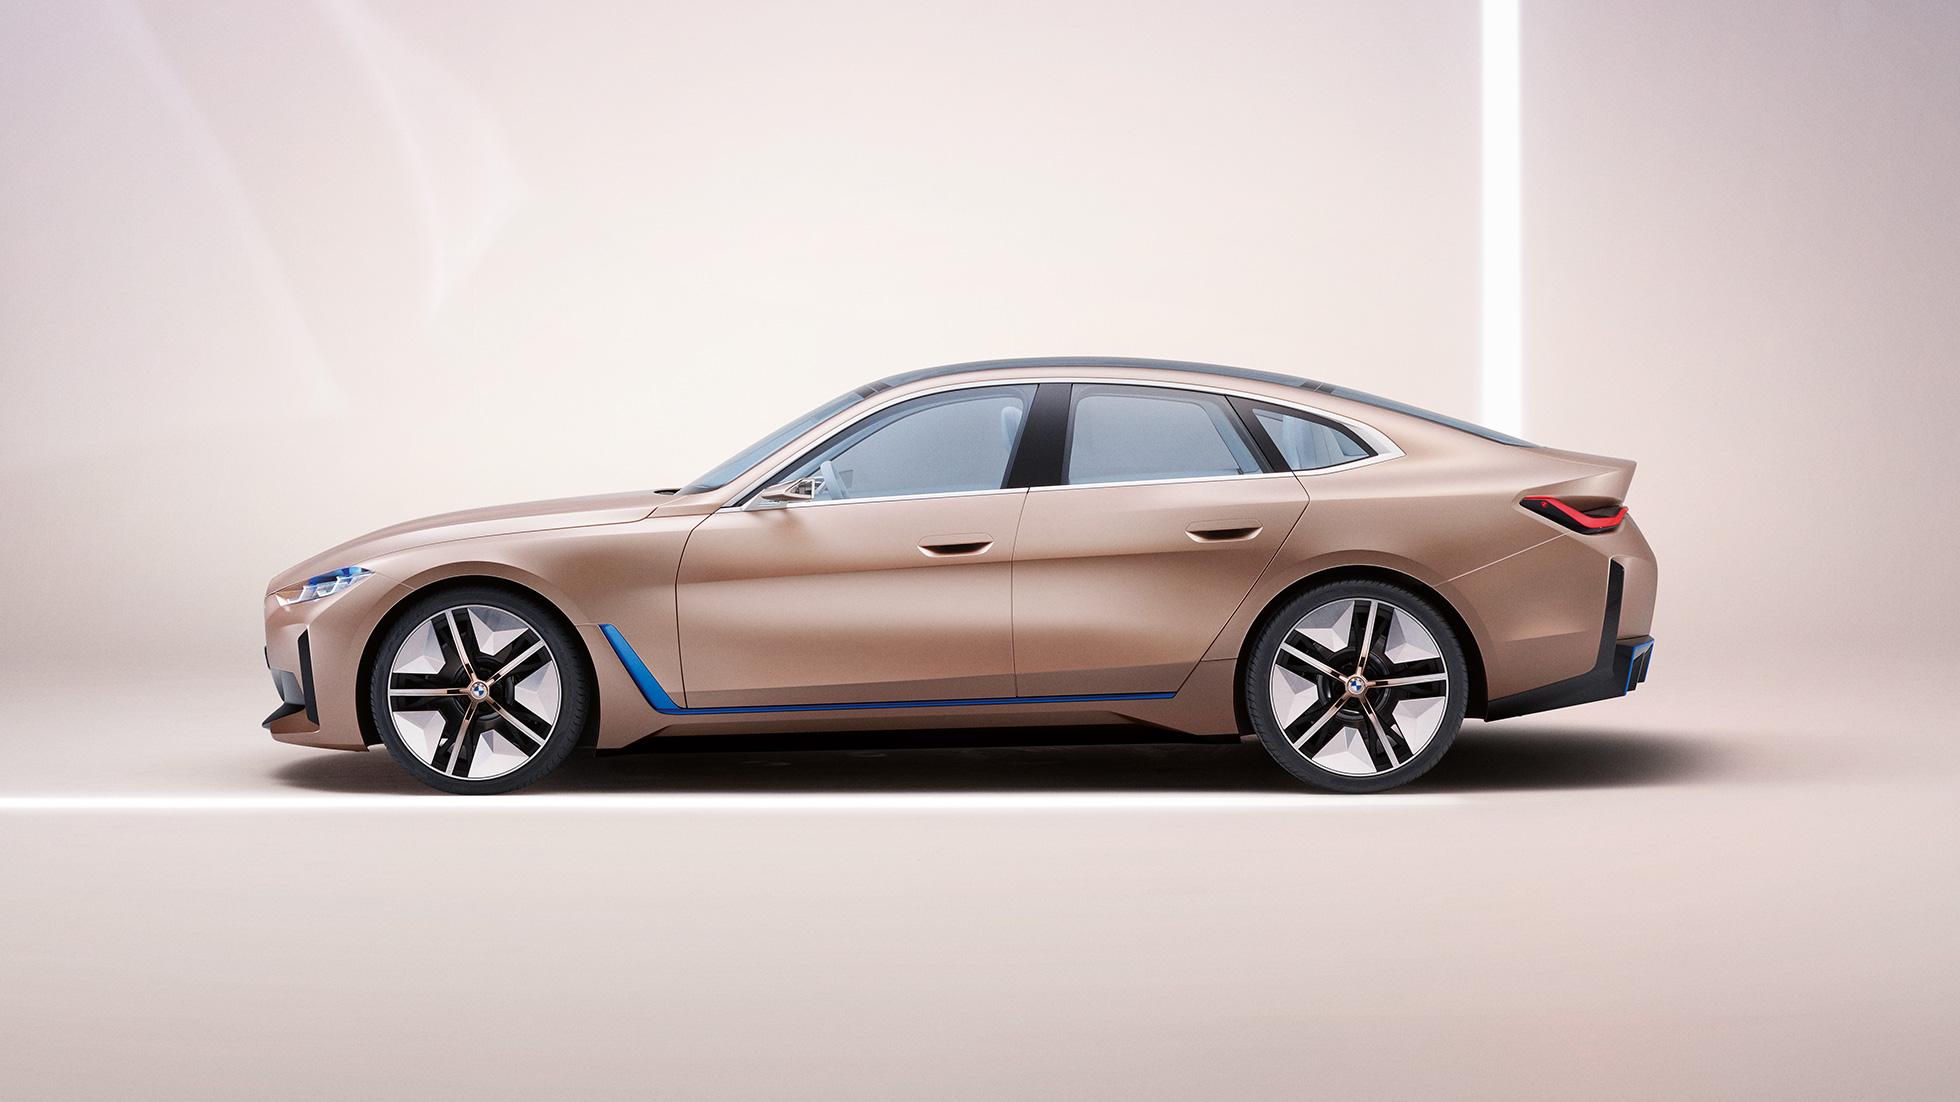 Bmw Concept I4 Concept Cars Bmw Uk